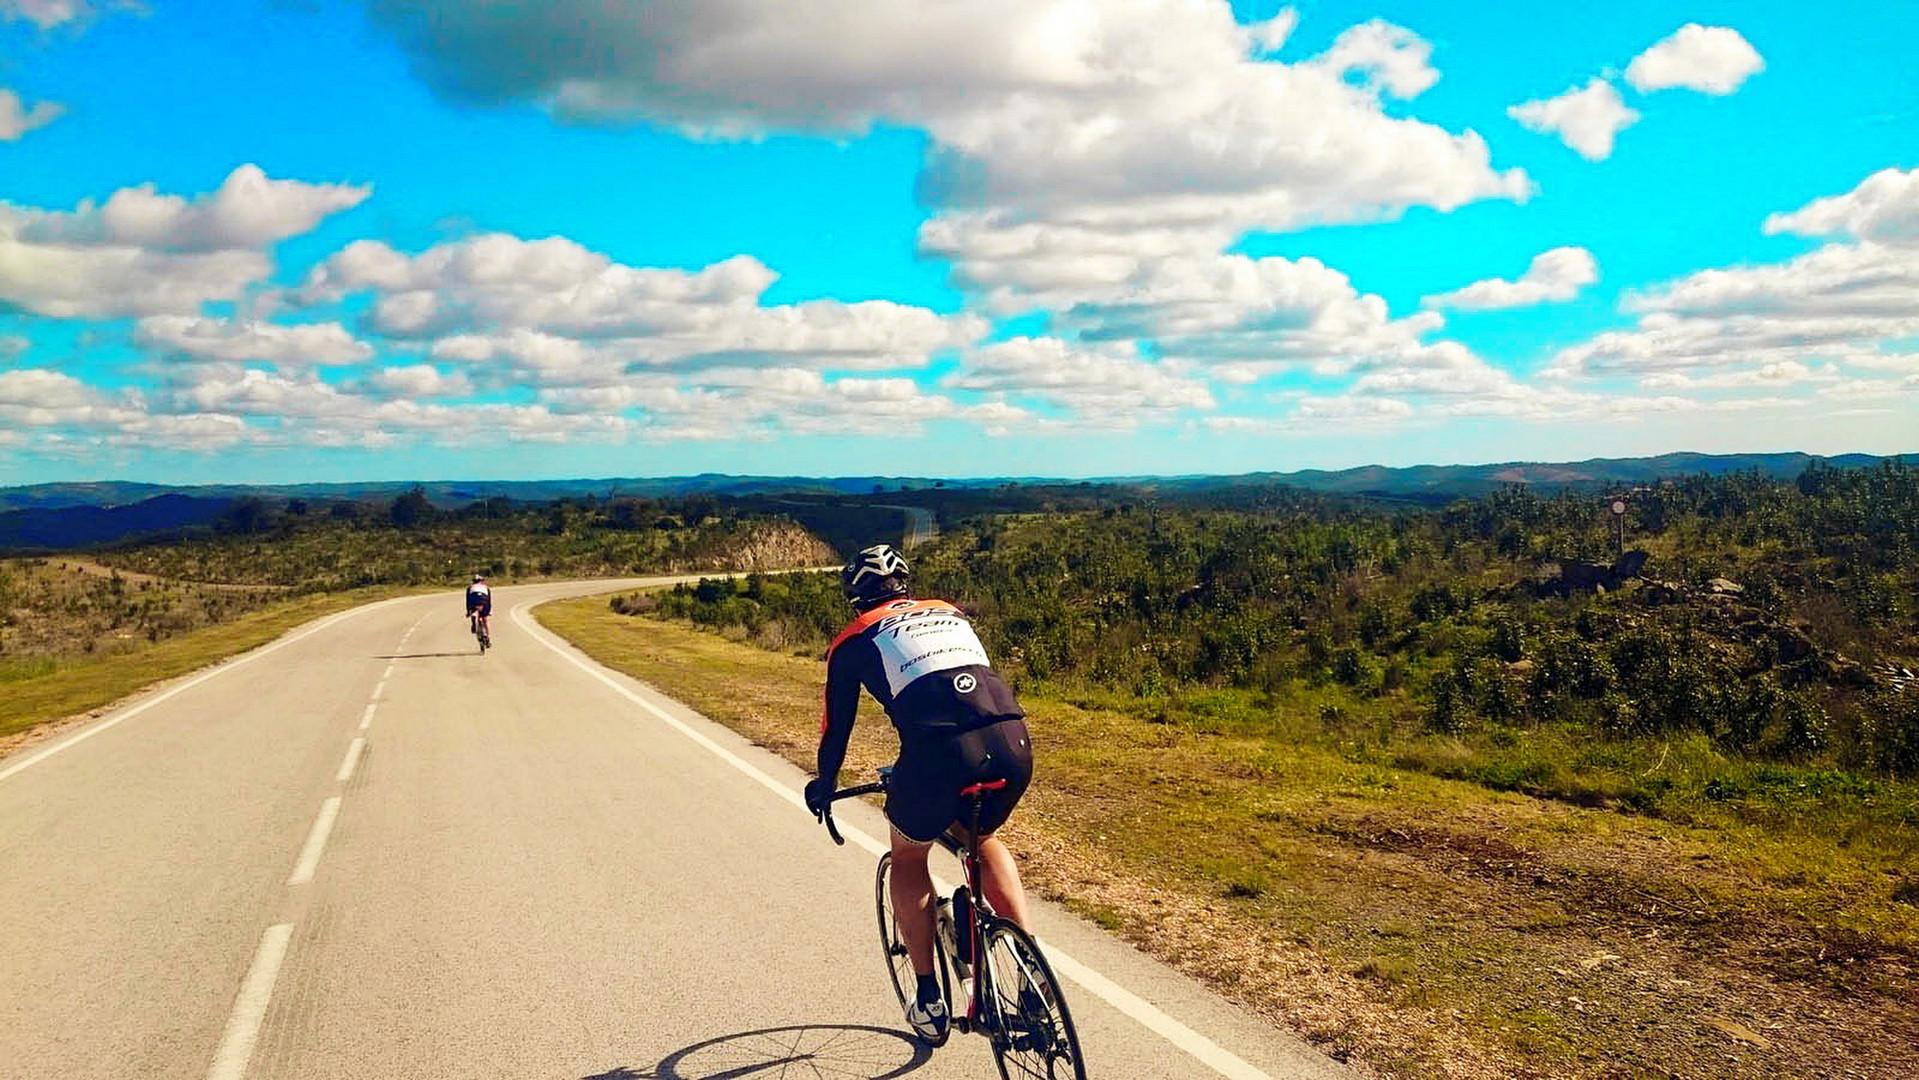 bike-tours-algarve-alg-ale_12.jpg